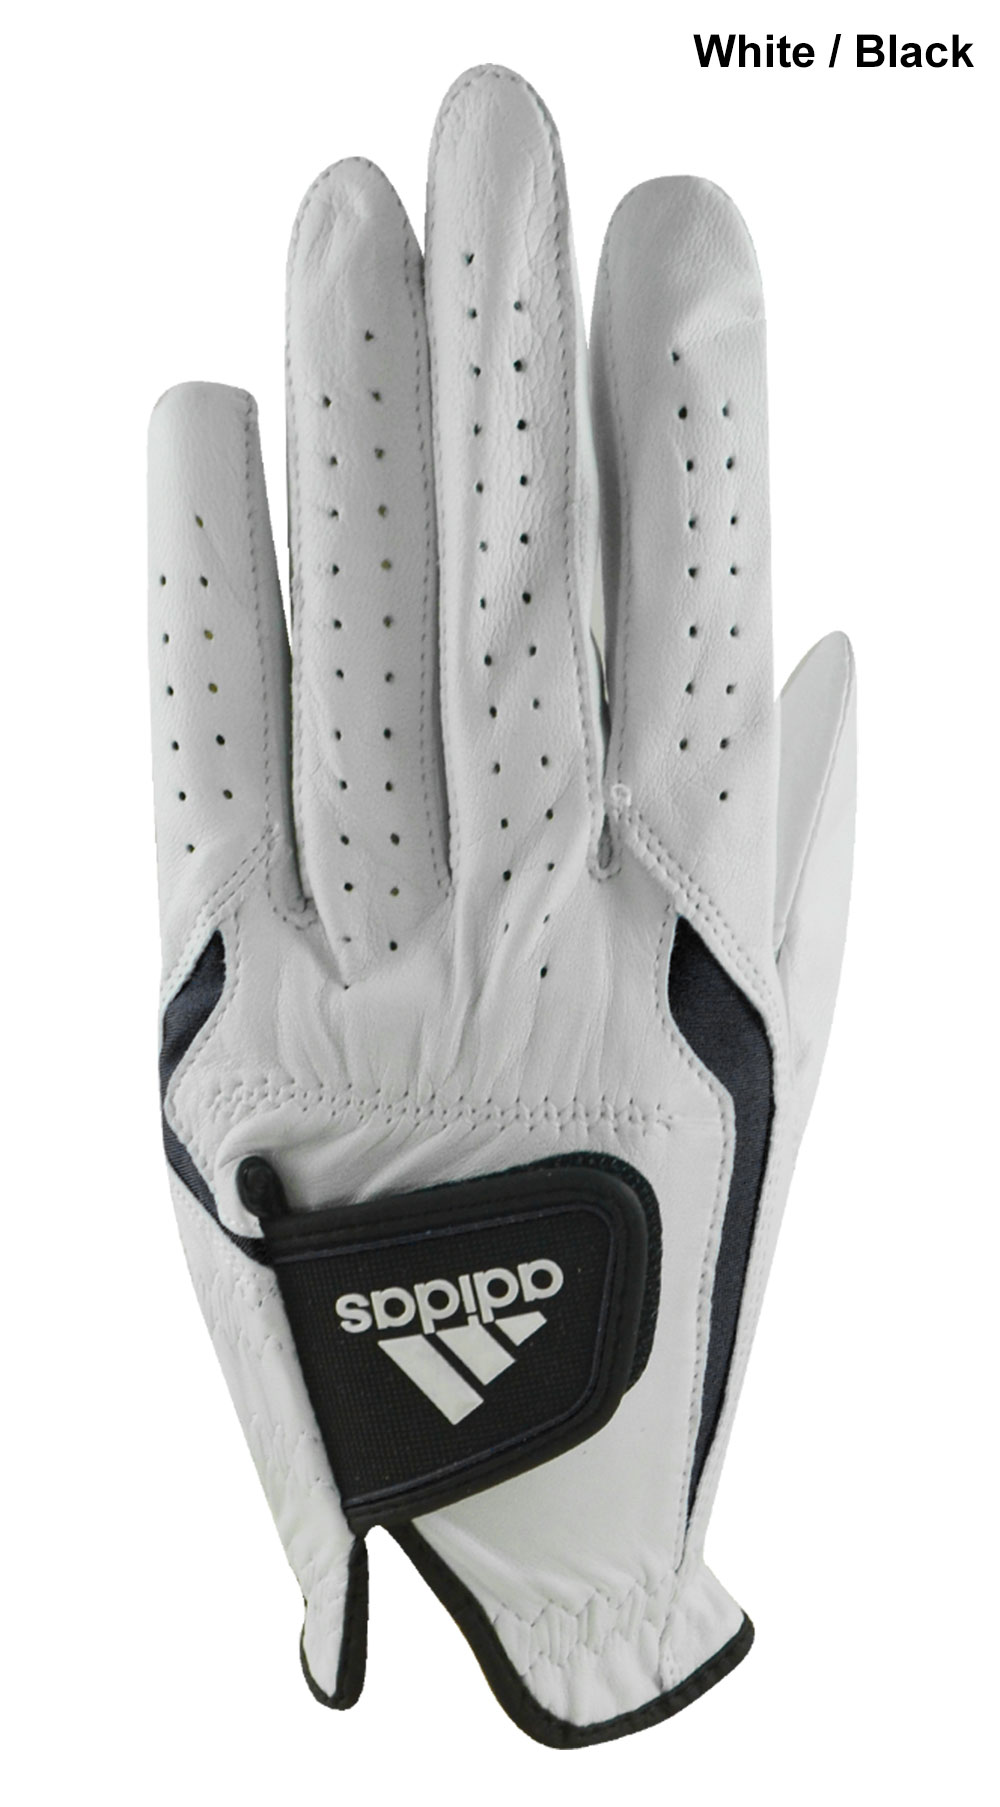 Black leather golf gloves - Http D3d71ba2asa5oz Cloudfront Net 40000065 Images 06adsadistrmlhwbk